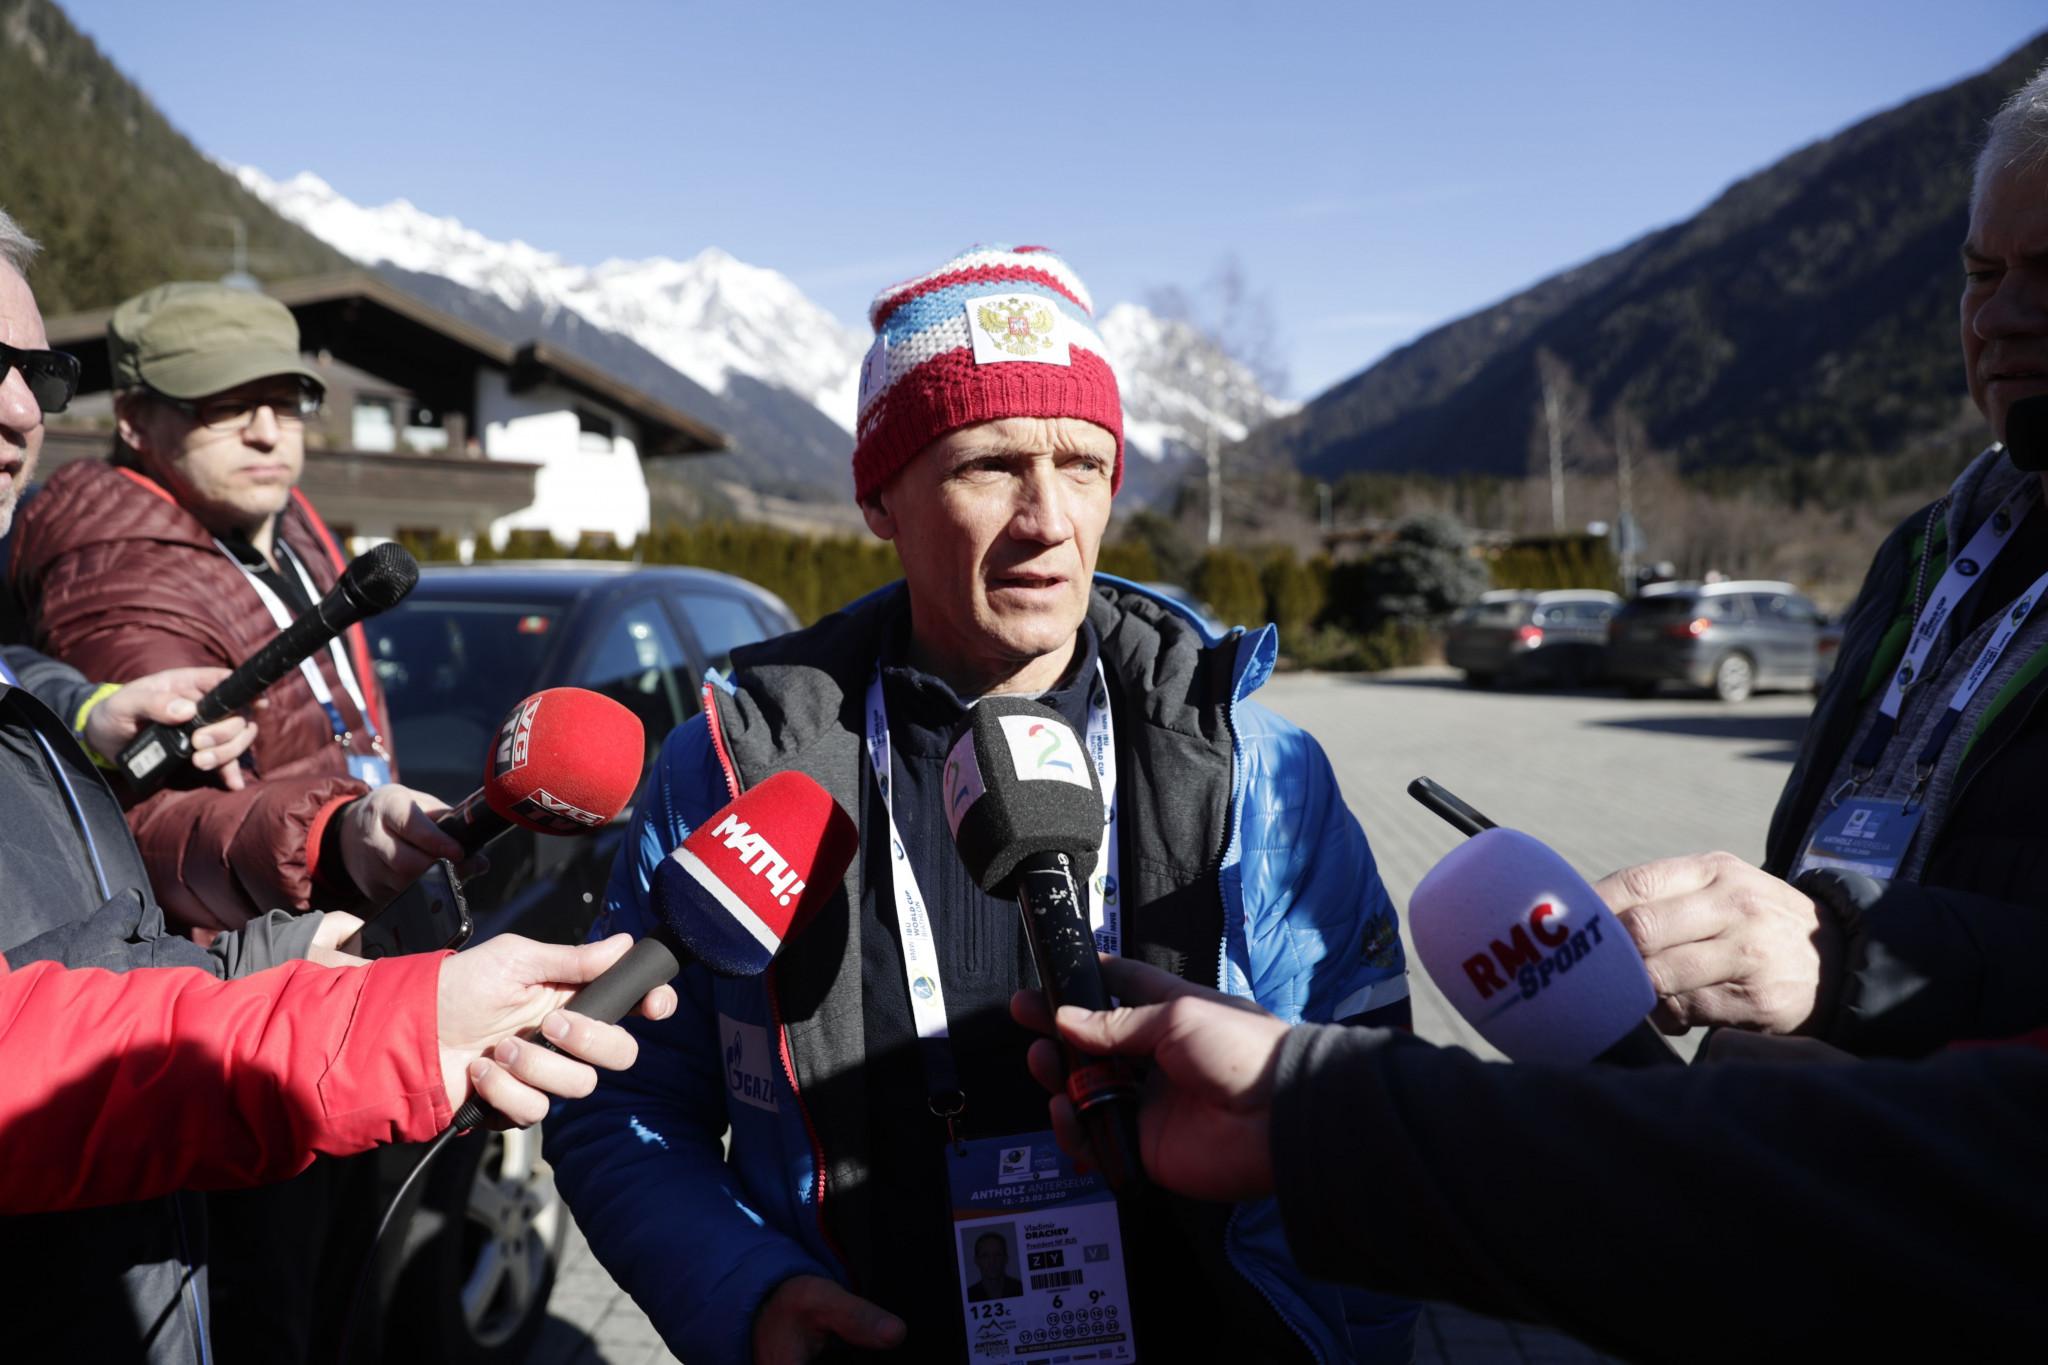 Russian Biathlon Union President Vladimir Drachev has claimed Alexander Loginov has been targeted ©Getty Images